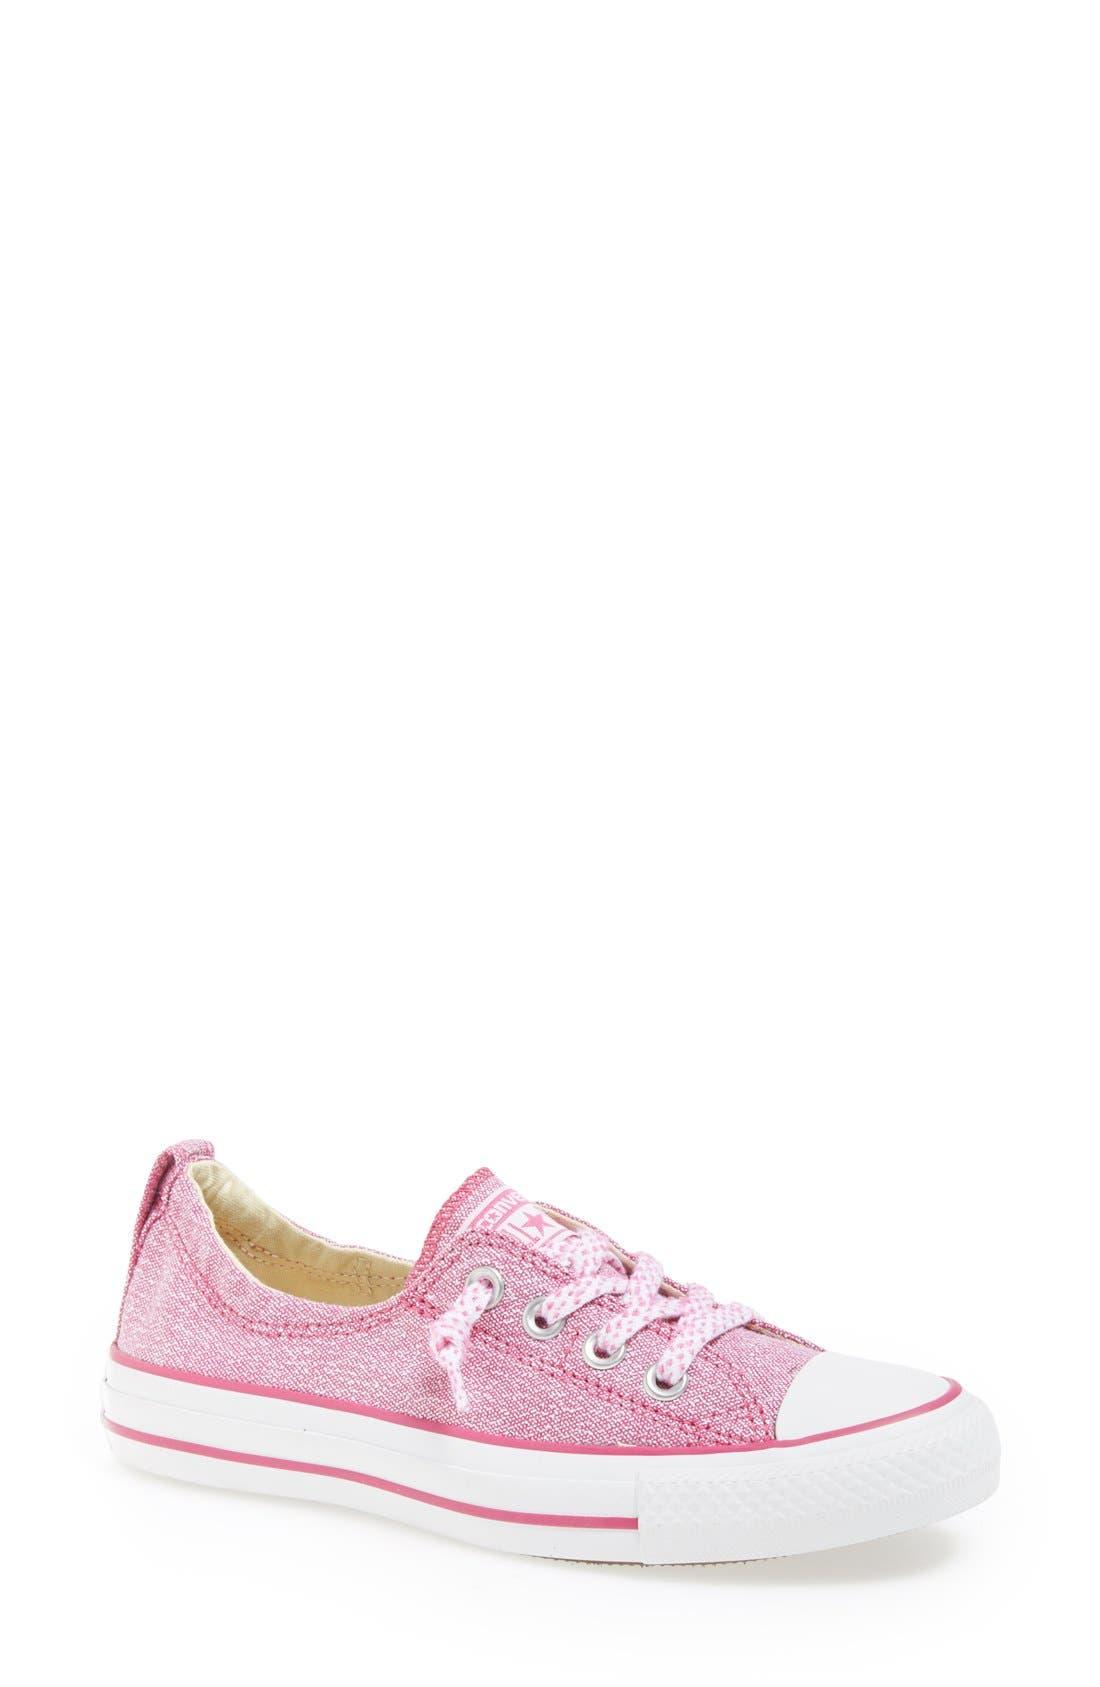 Alternate Image 1 Selected - Converse Chuck Taylor® 'Shoreline' Linen Sneaker (Women)